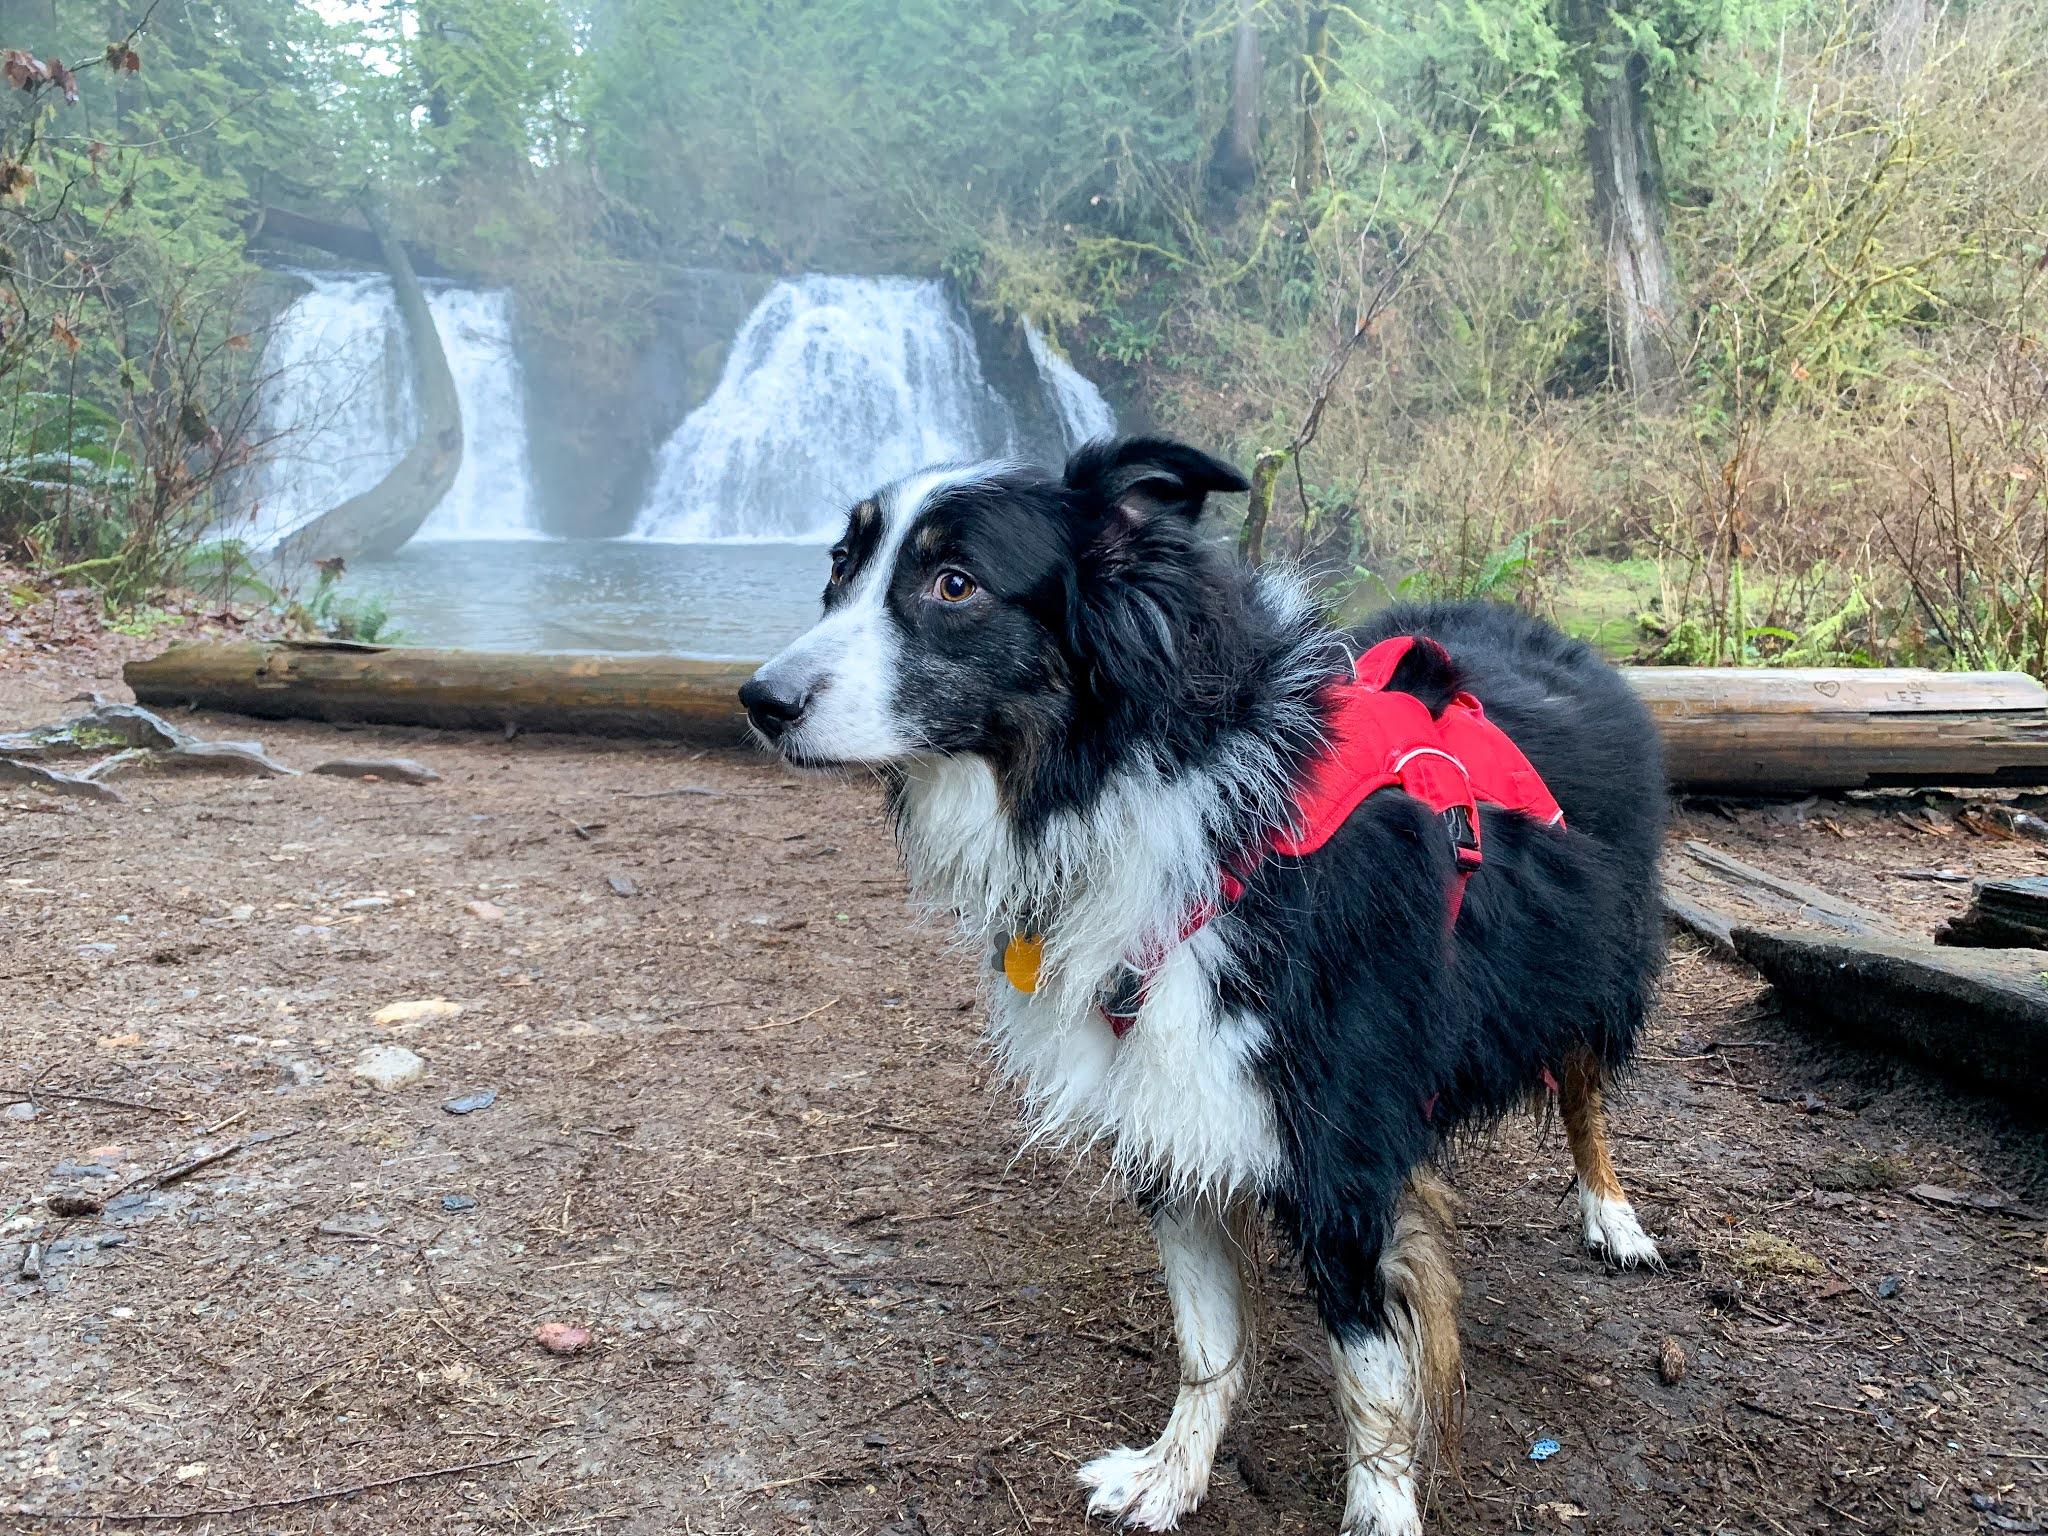 Dog at Cherry Creek Falls